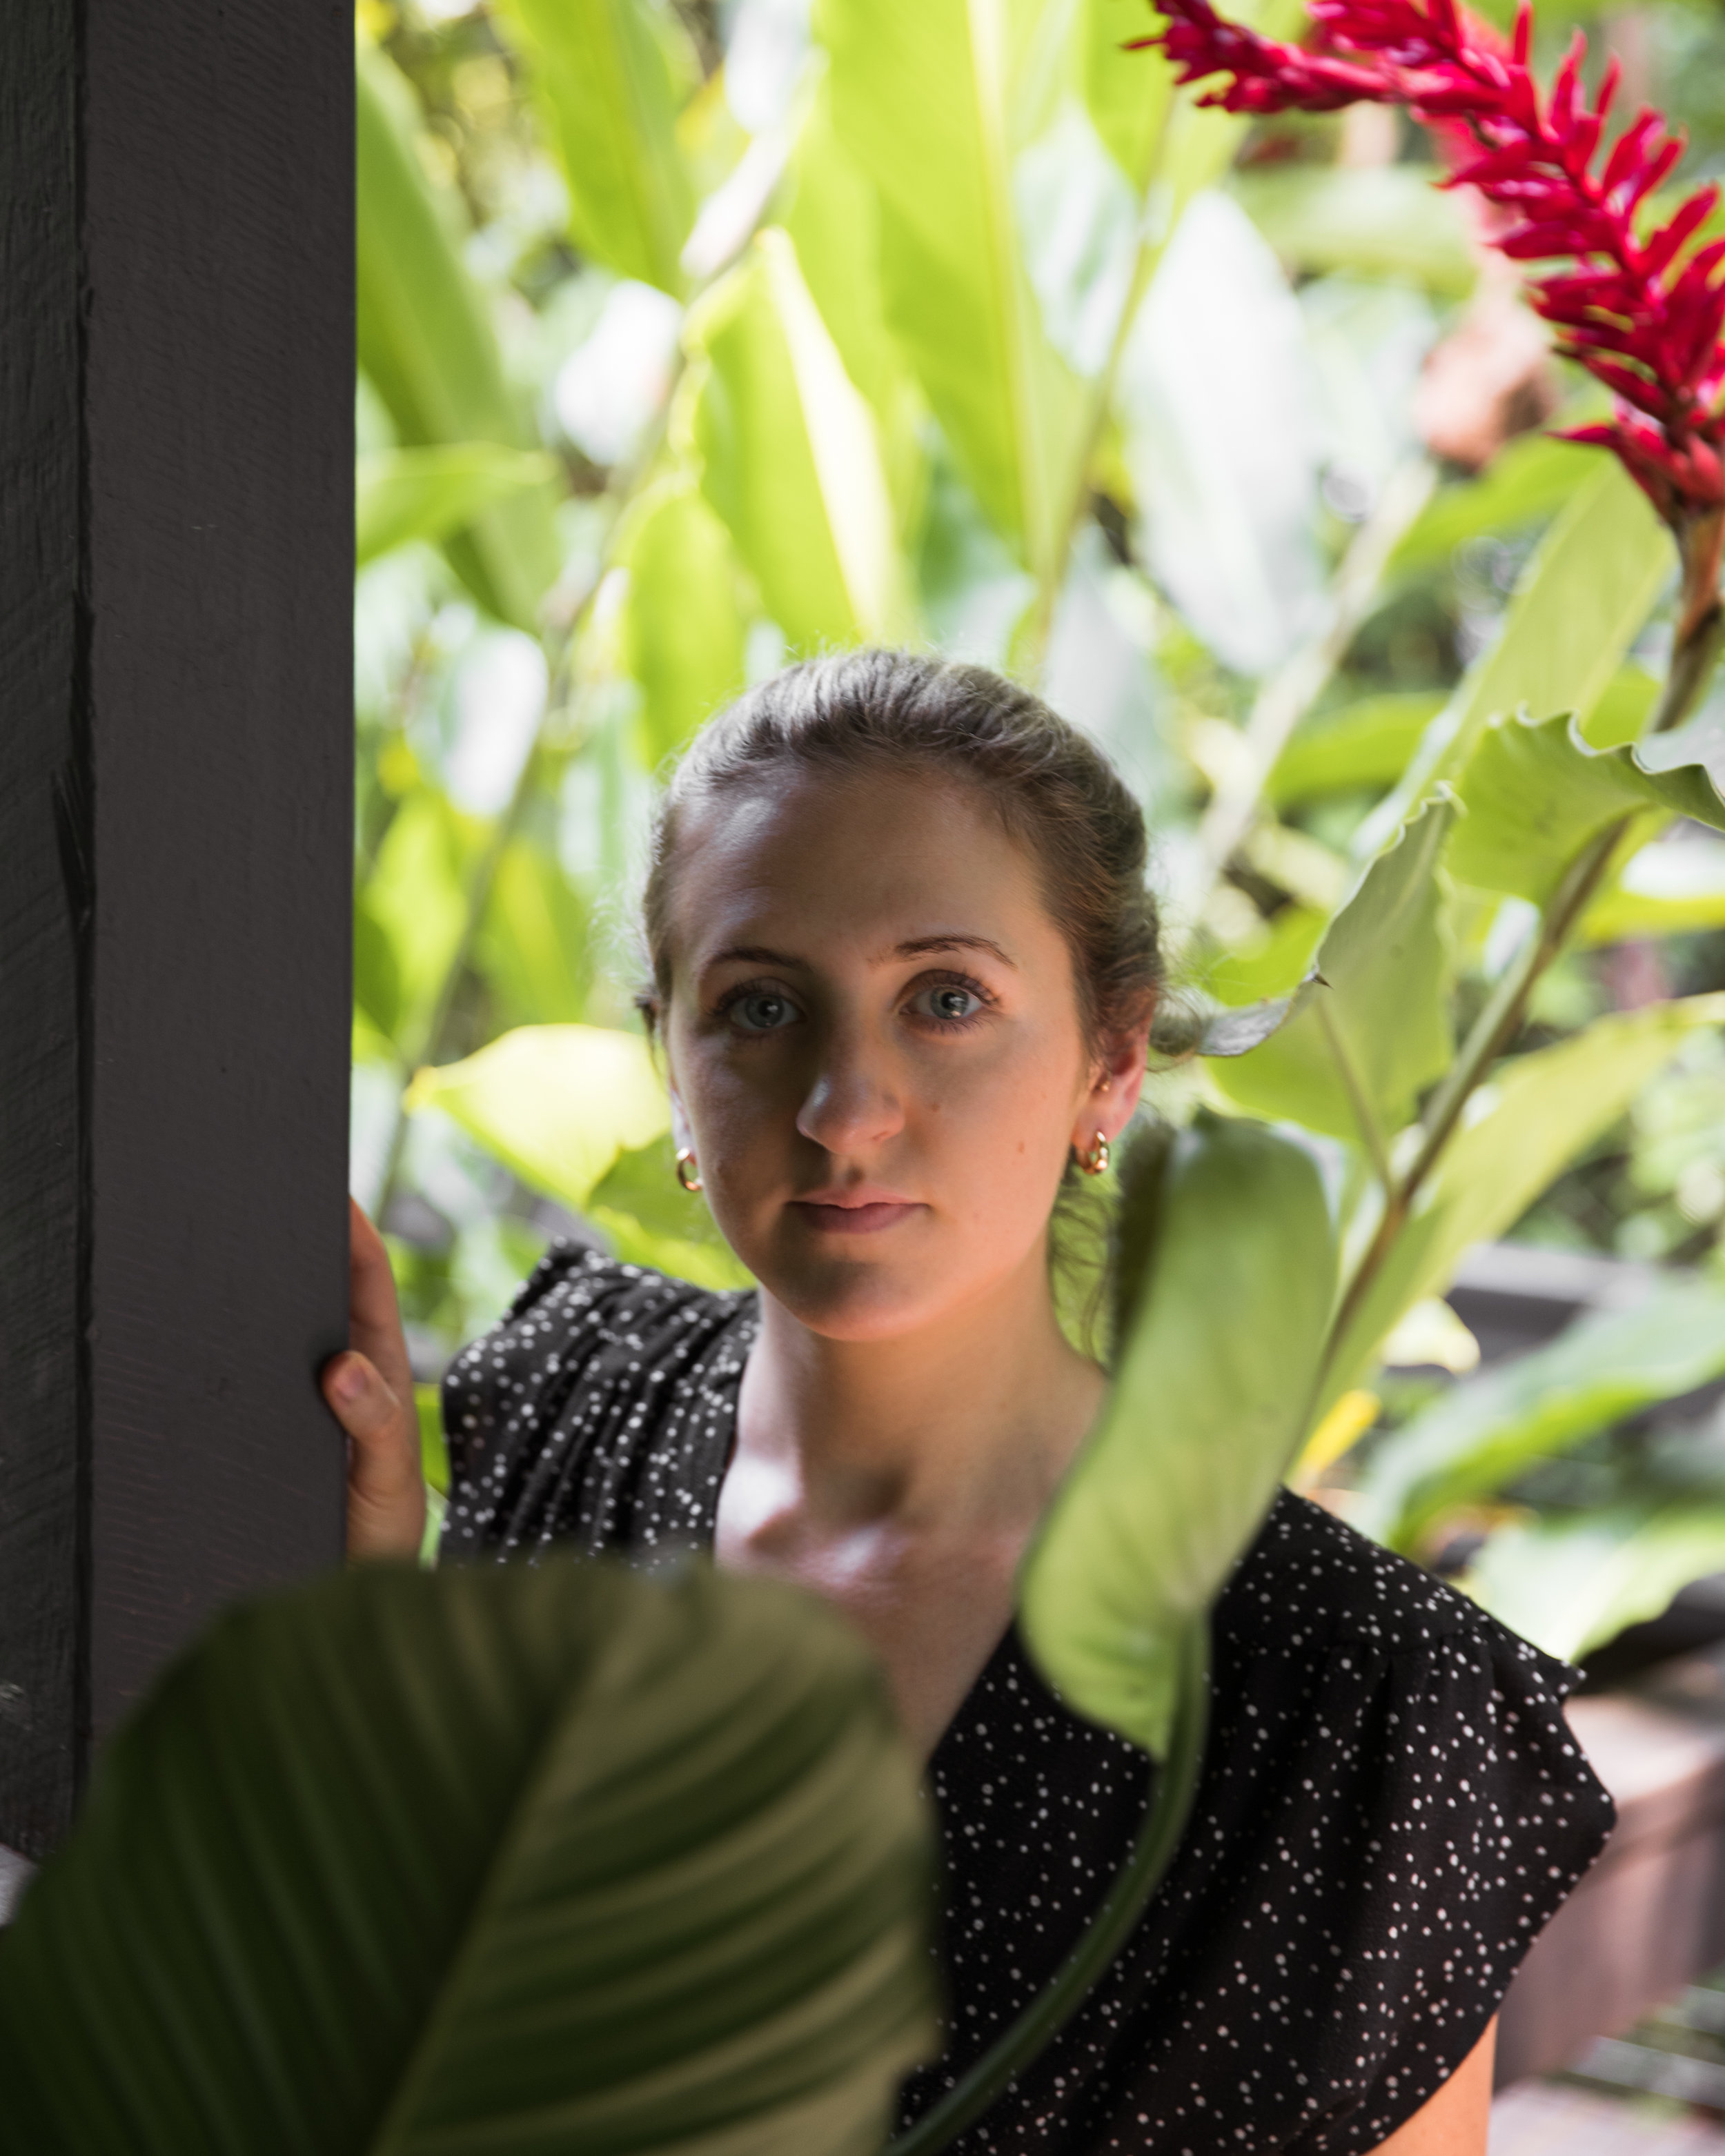 Meet Bec - The yoga-addicted, plant-loving, wellness-seeking Osteopath!